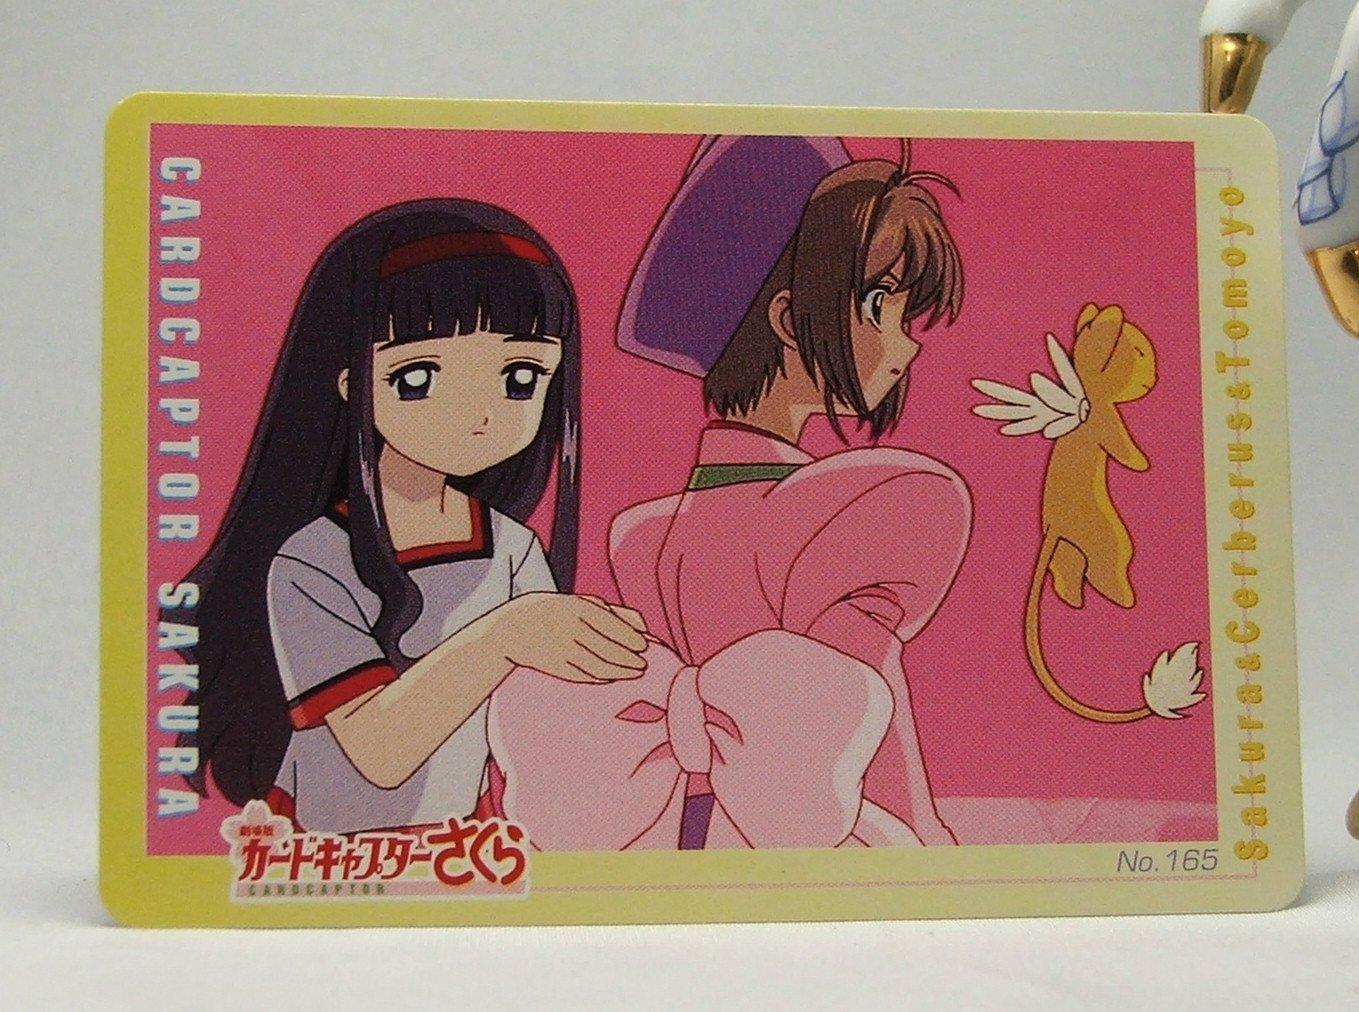 Cardcaptor Sakura Amada PP Trading Card #165